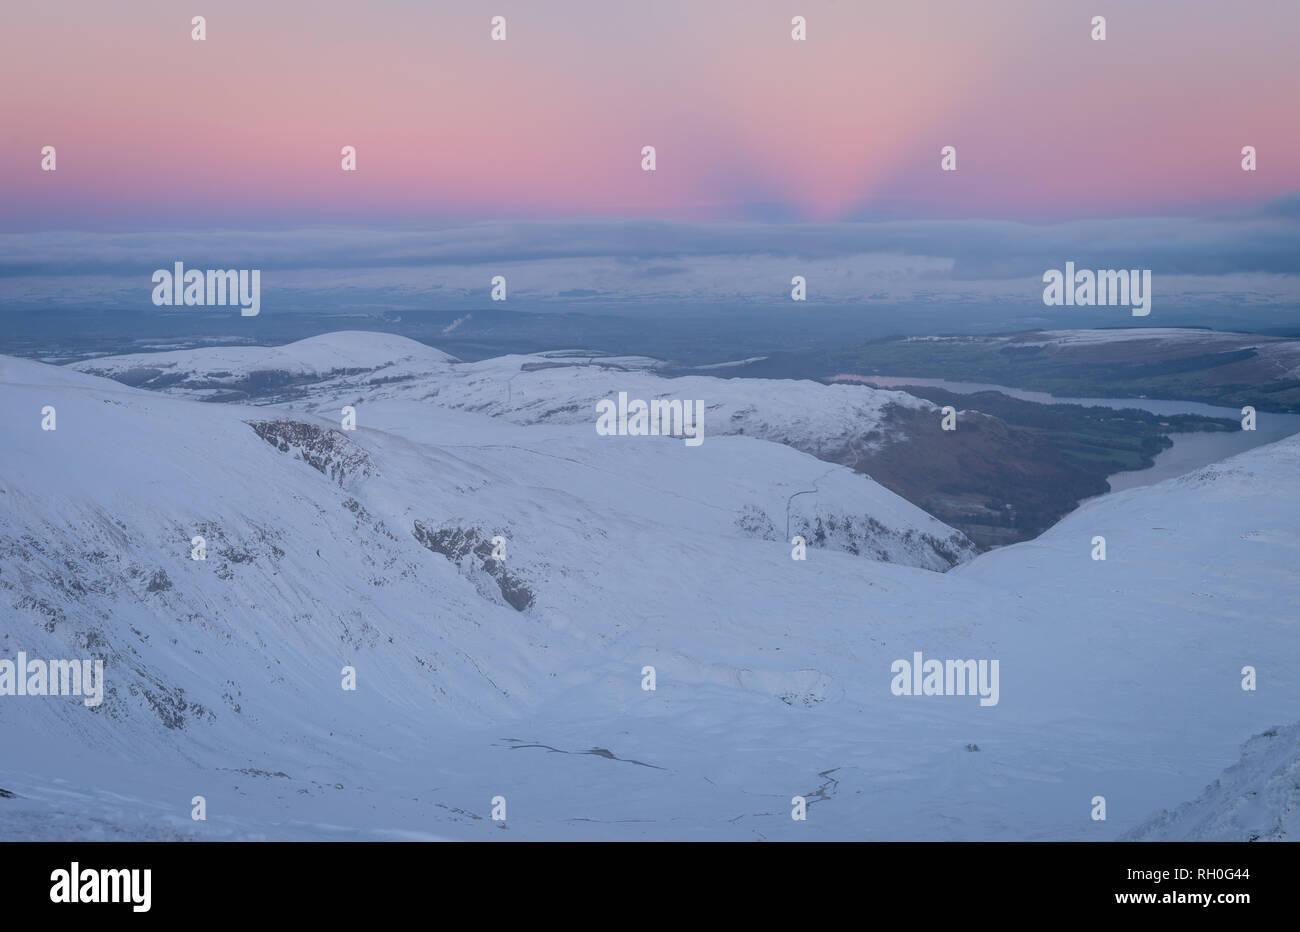 Ullswater, Lake District, UK. 30th Jan, 2019. Elusive anticrepuscular rays a twilight phenomena occurring at the antisolar point in the sky. Credit: Rafael Garea-Balado/Alamy Live News - Stock Image